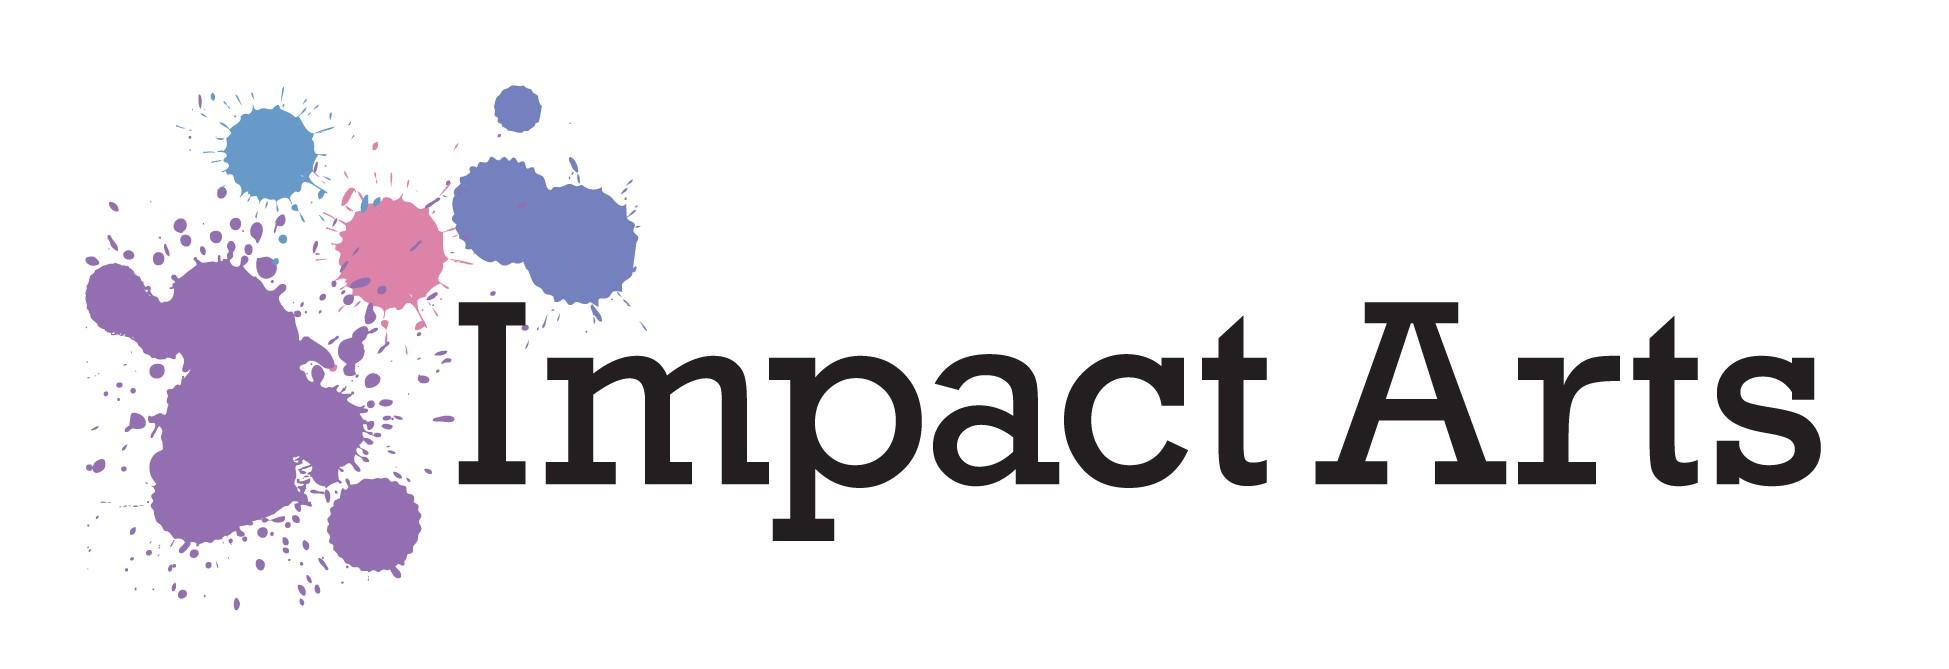 Impact Arts